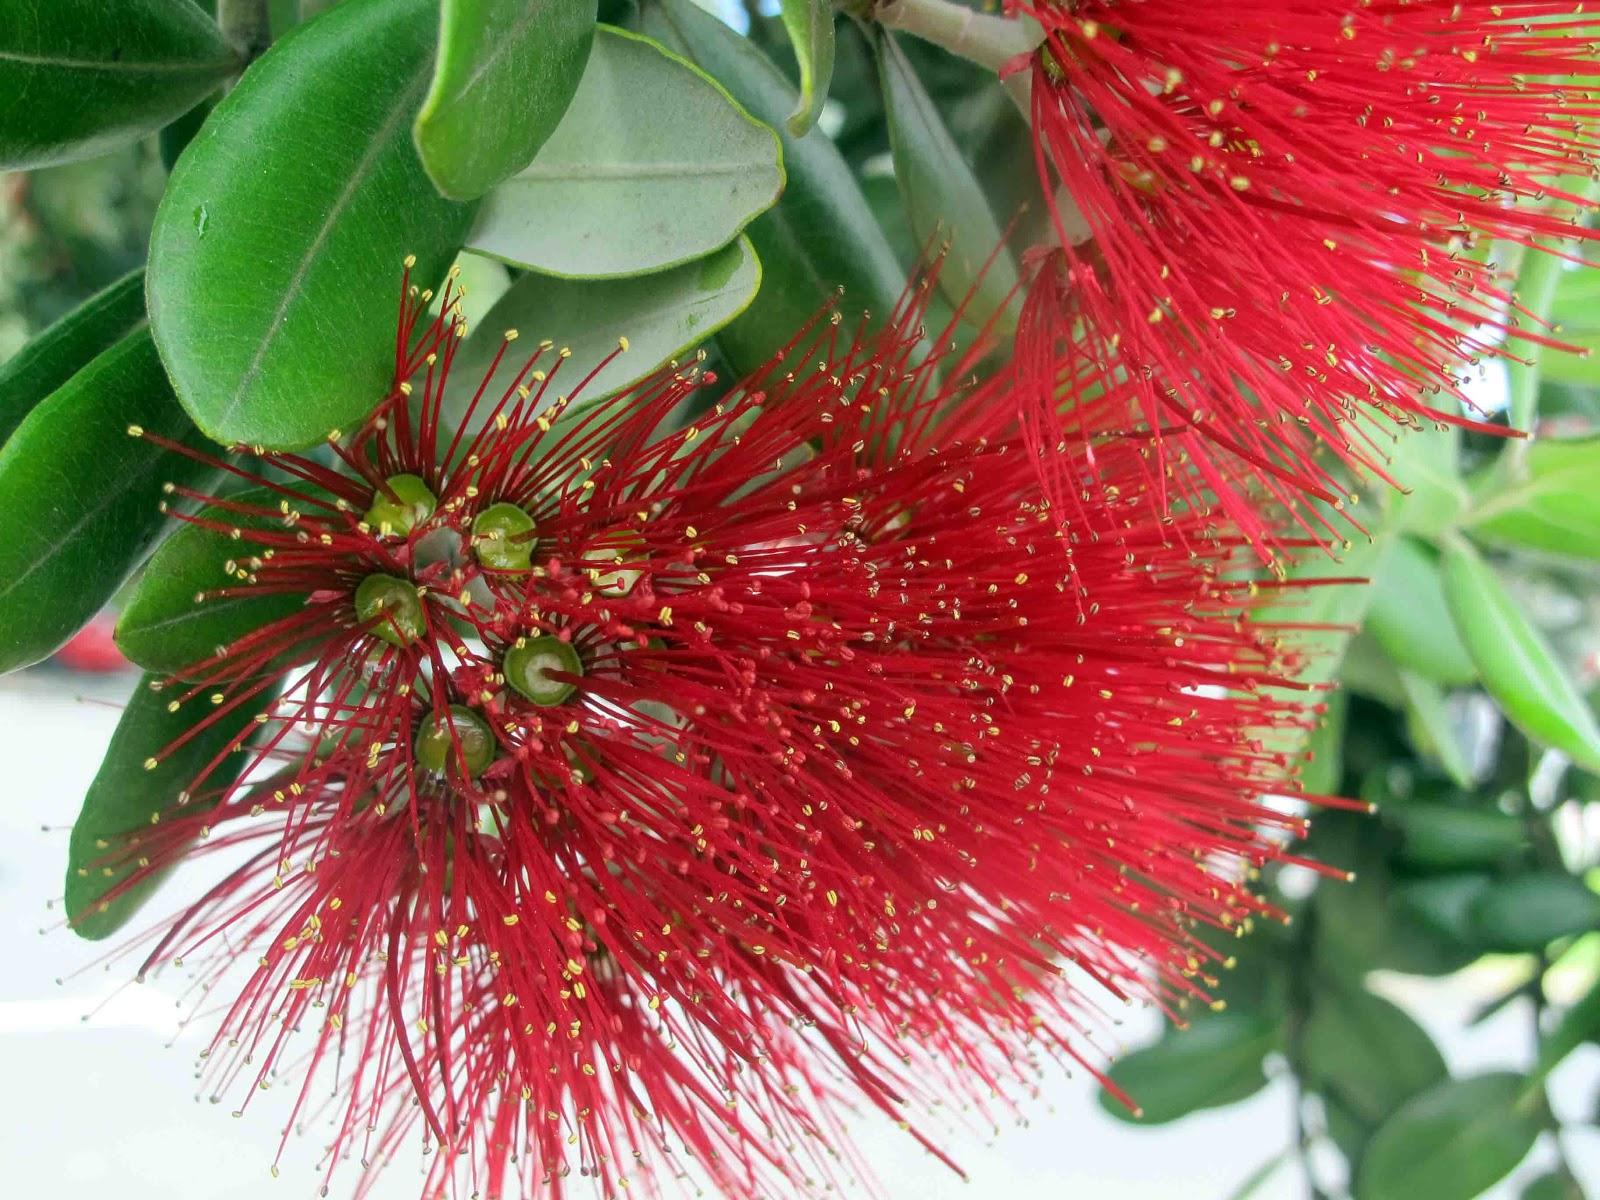 Shoot And Eat: Pohutakawa ( The New Zealand Christmas Tree